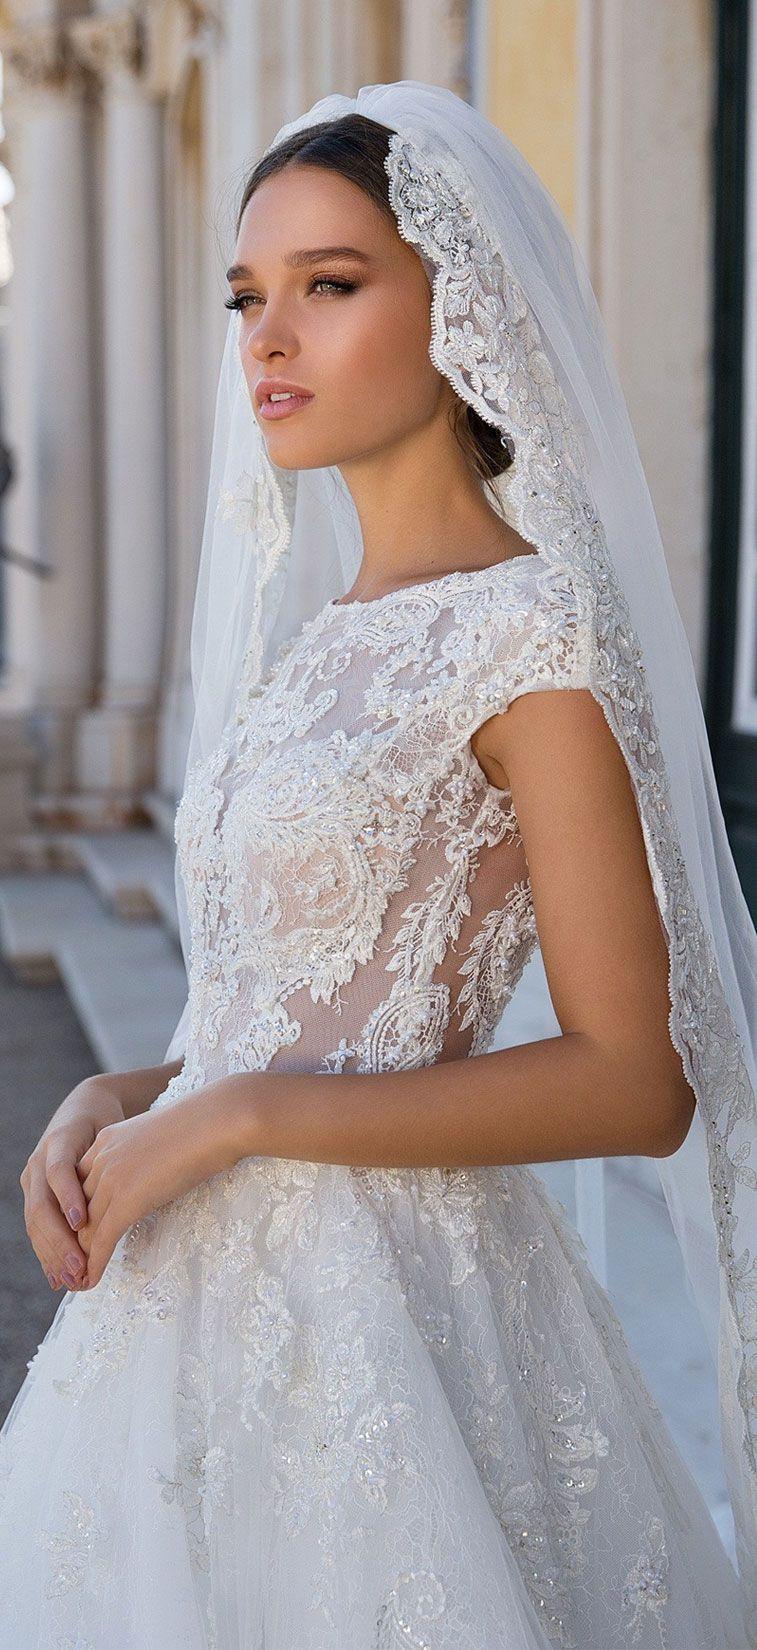 Milla nova wedding dress inspiration wedding story pinterest